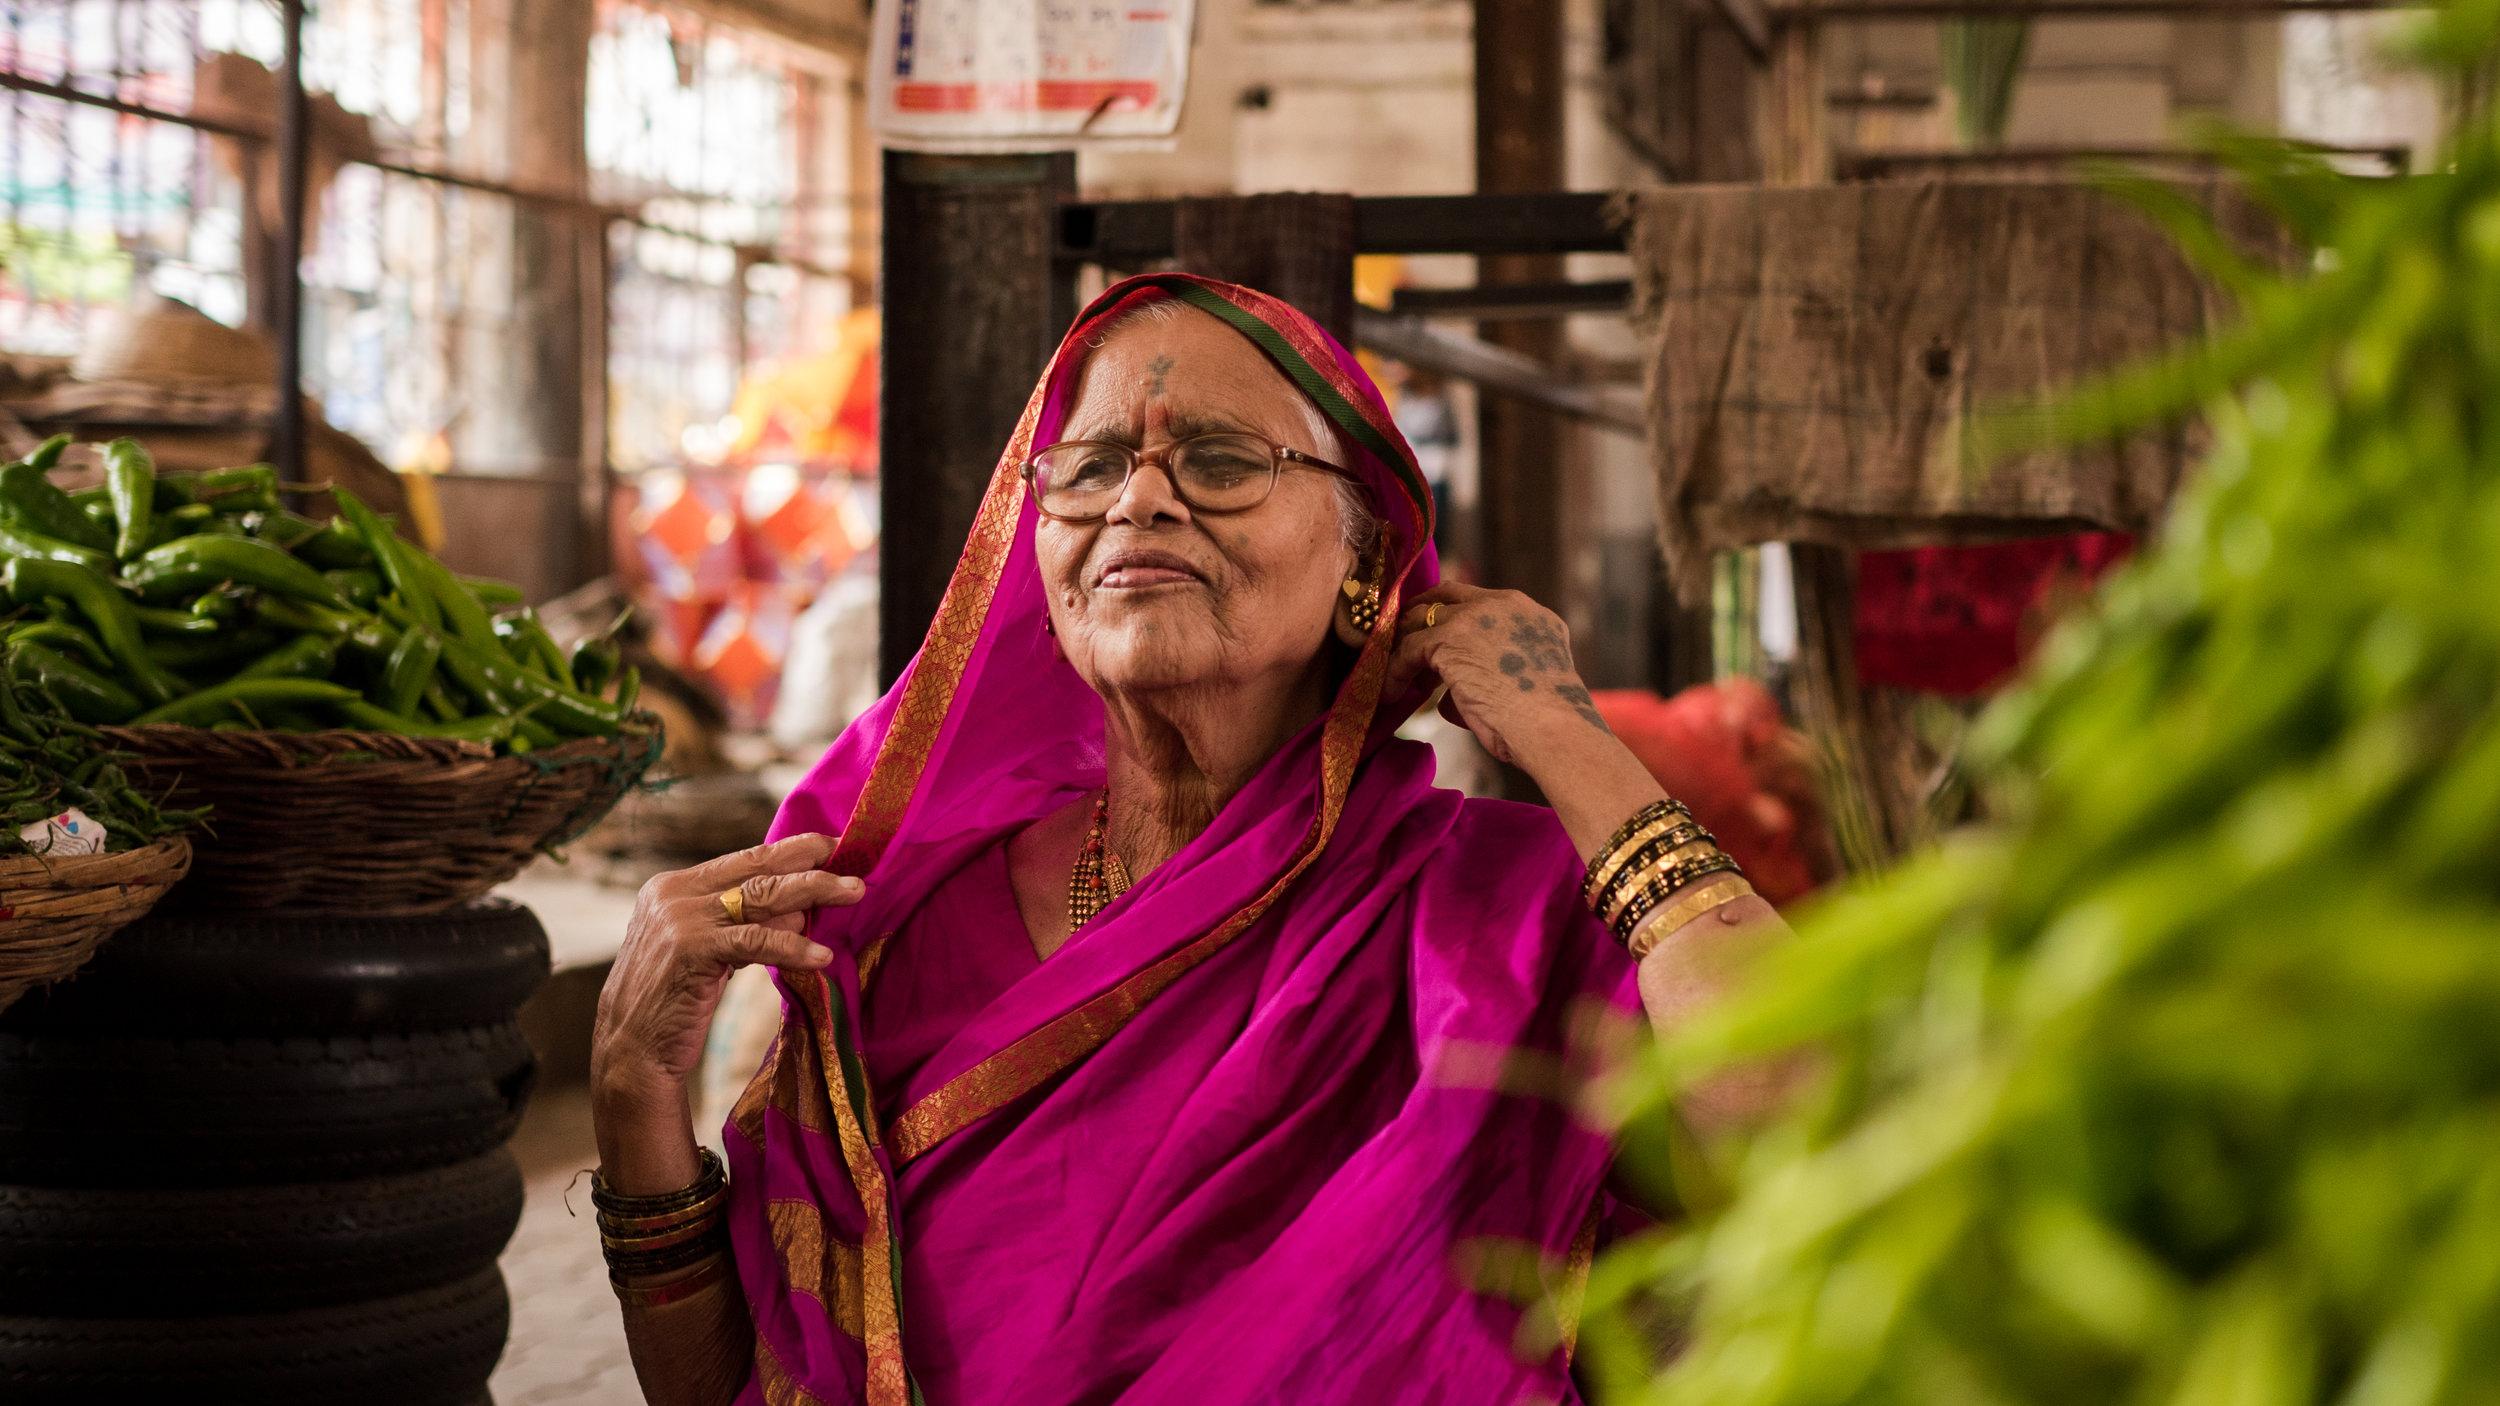 Feeling Myself (Mahatma Jyotiba Phule Mandai, Pune, Maharashtra)